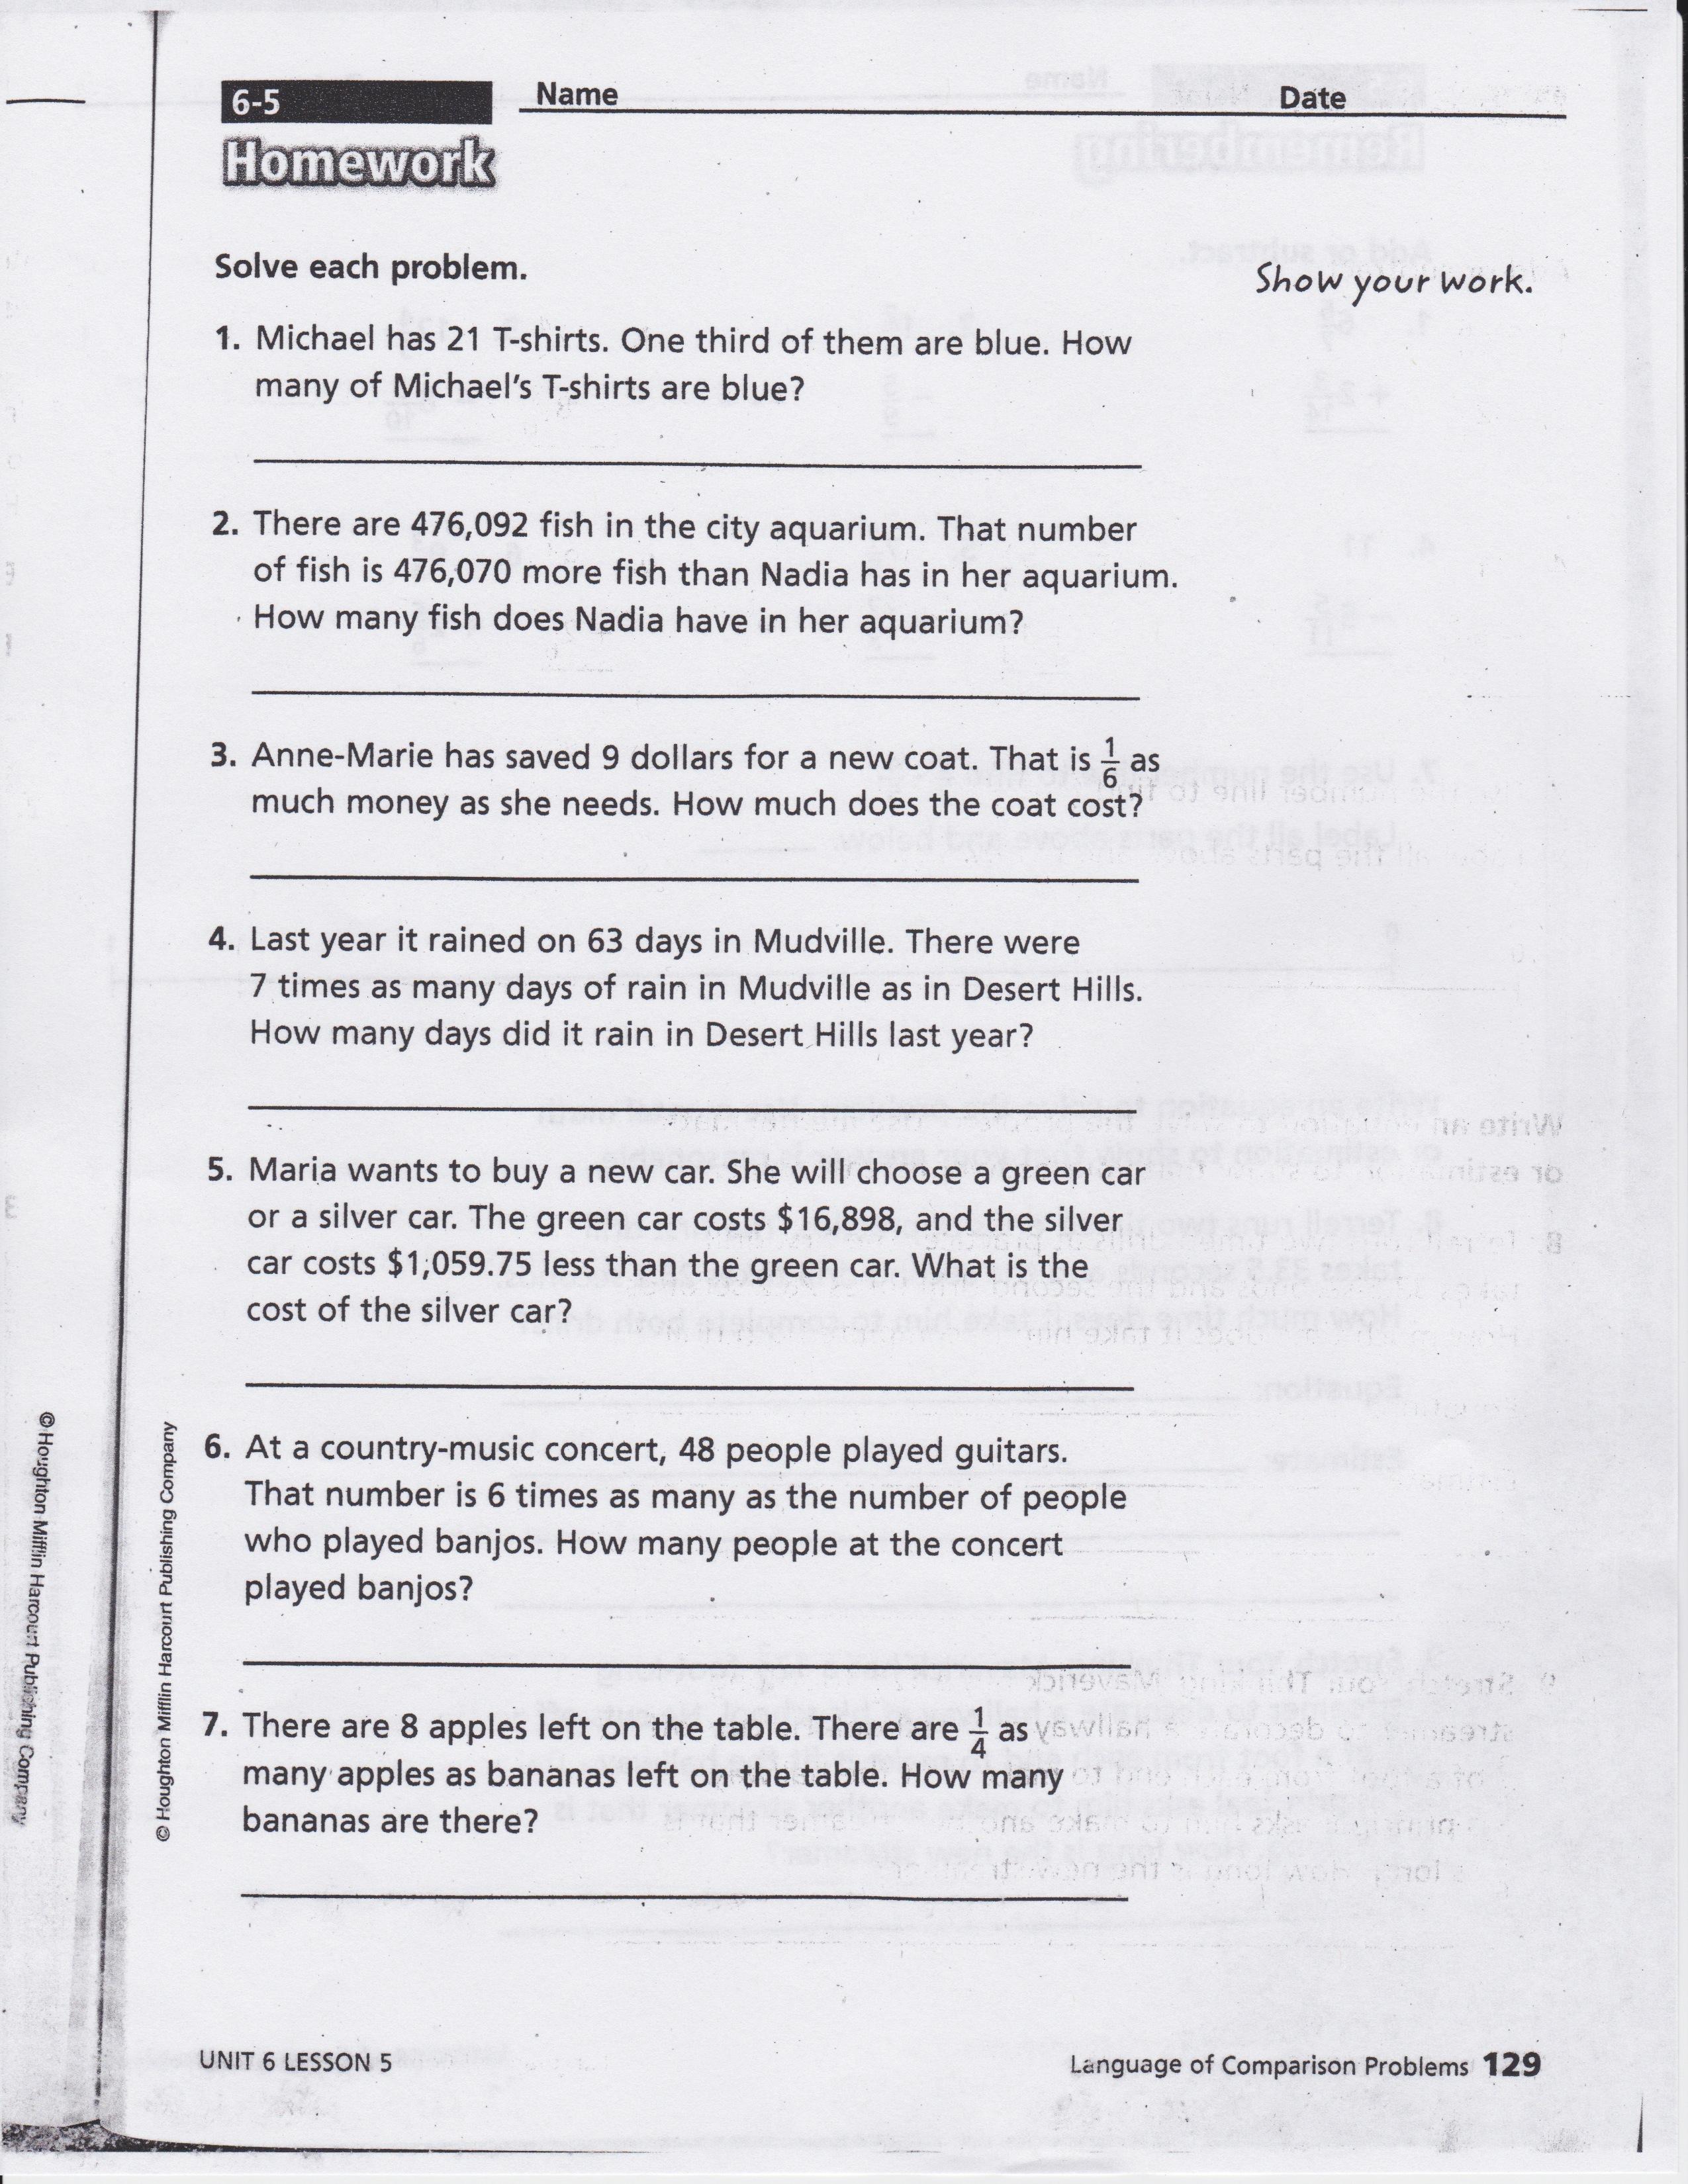 homework 6 this homework is